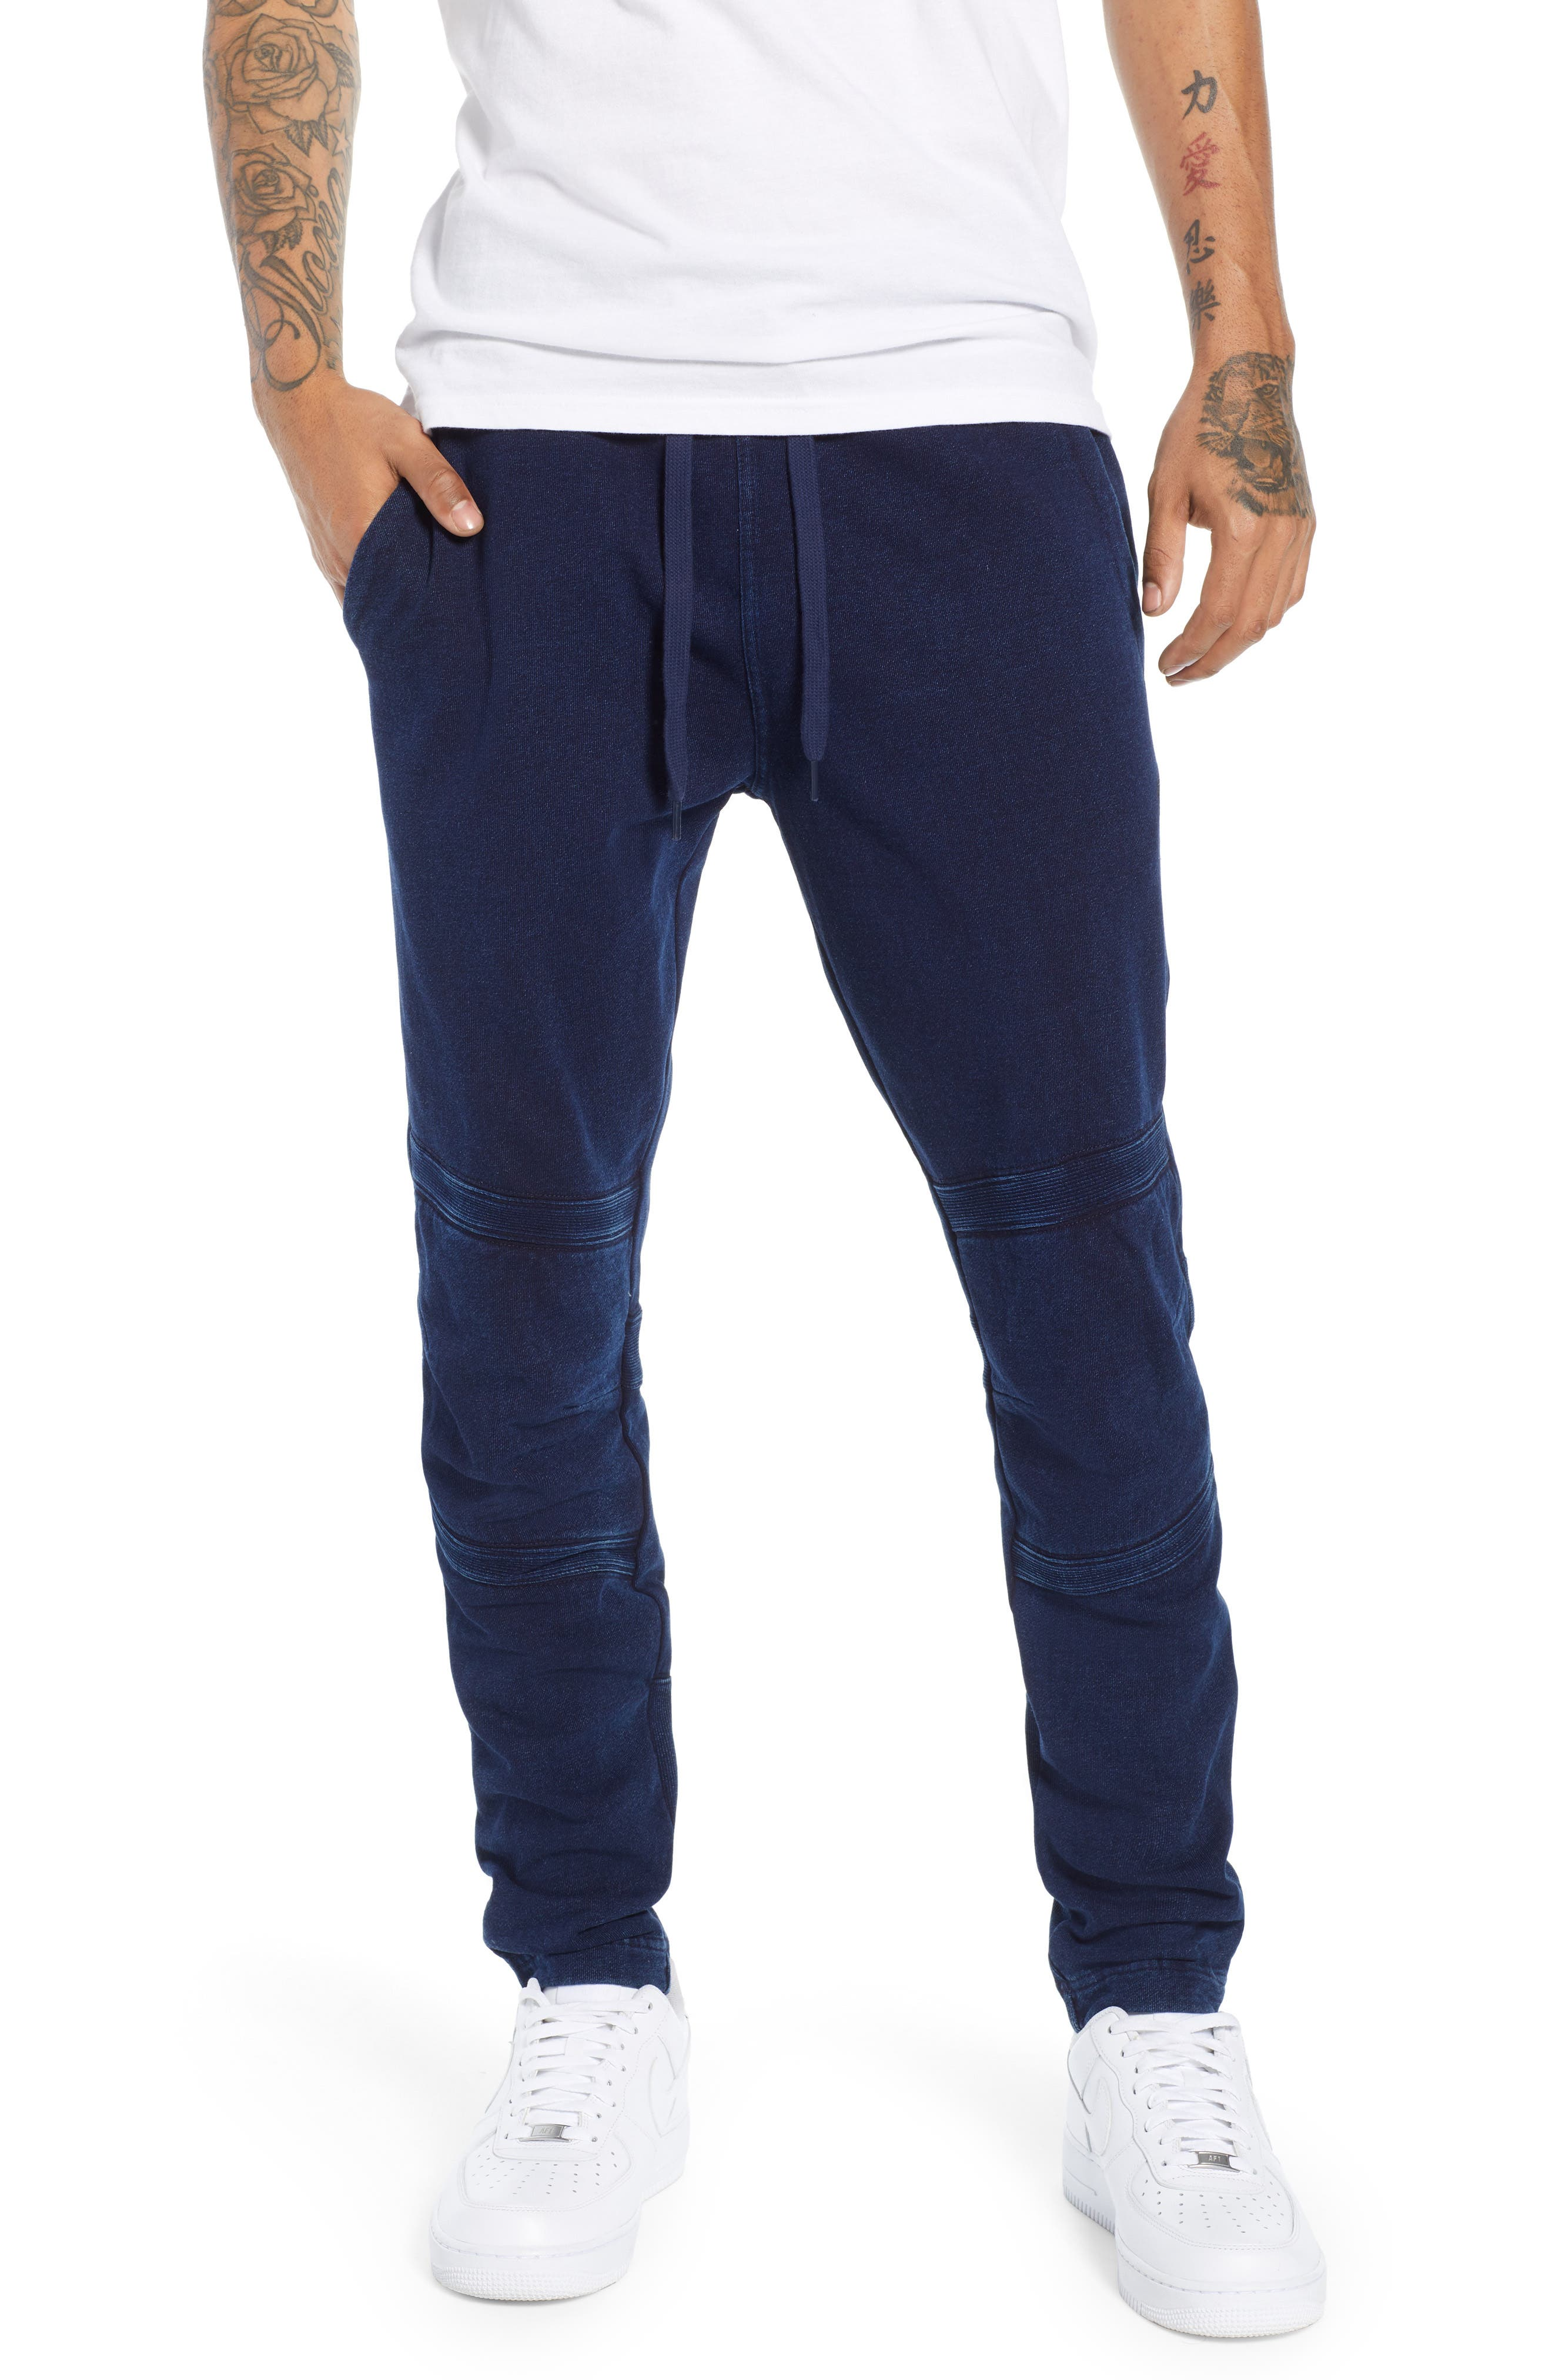 G-STAR RAW Motac-X Slim Fit Sweat Pants, Main, color, 001